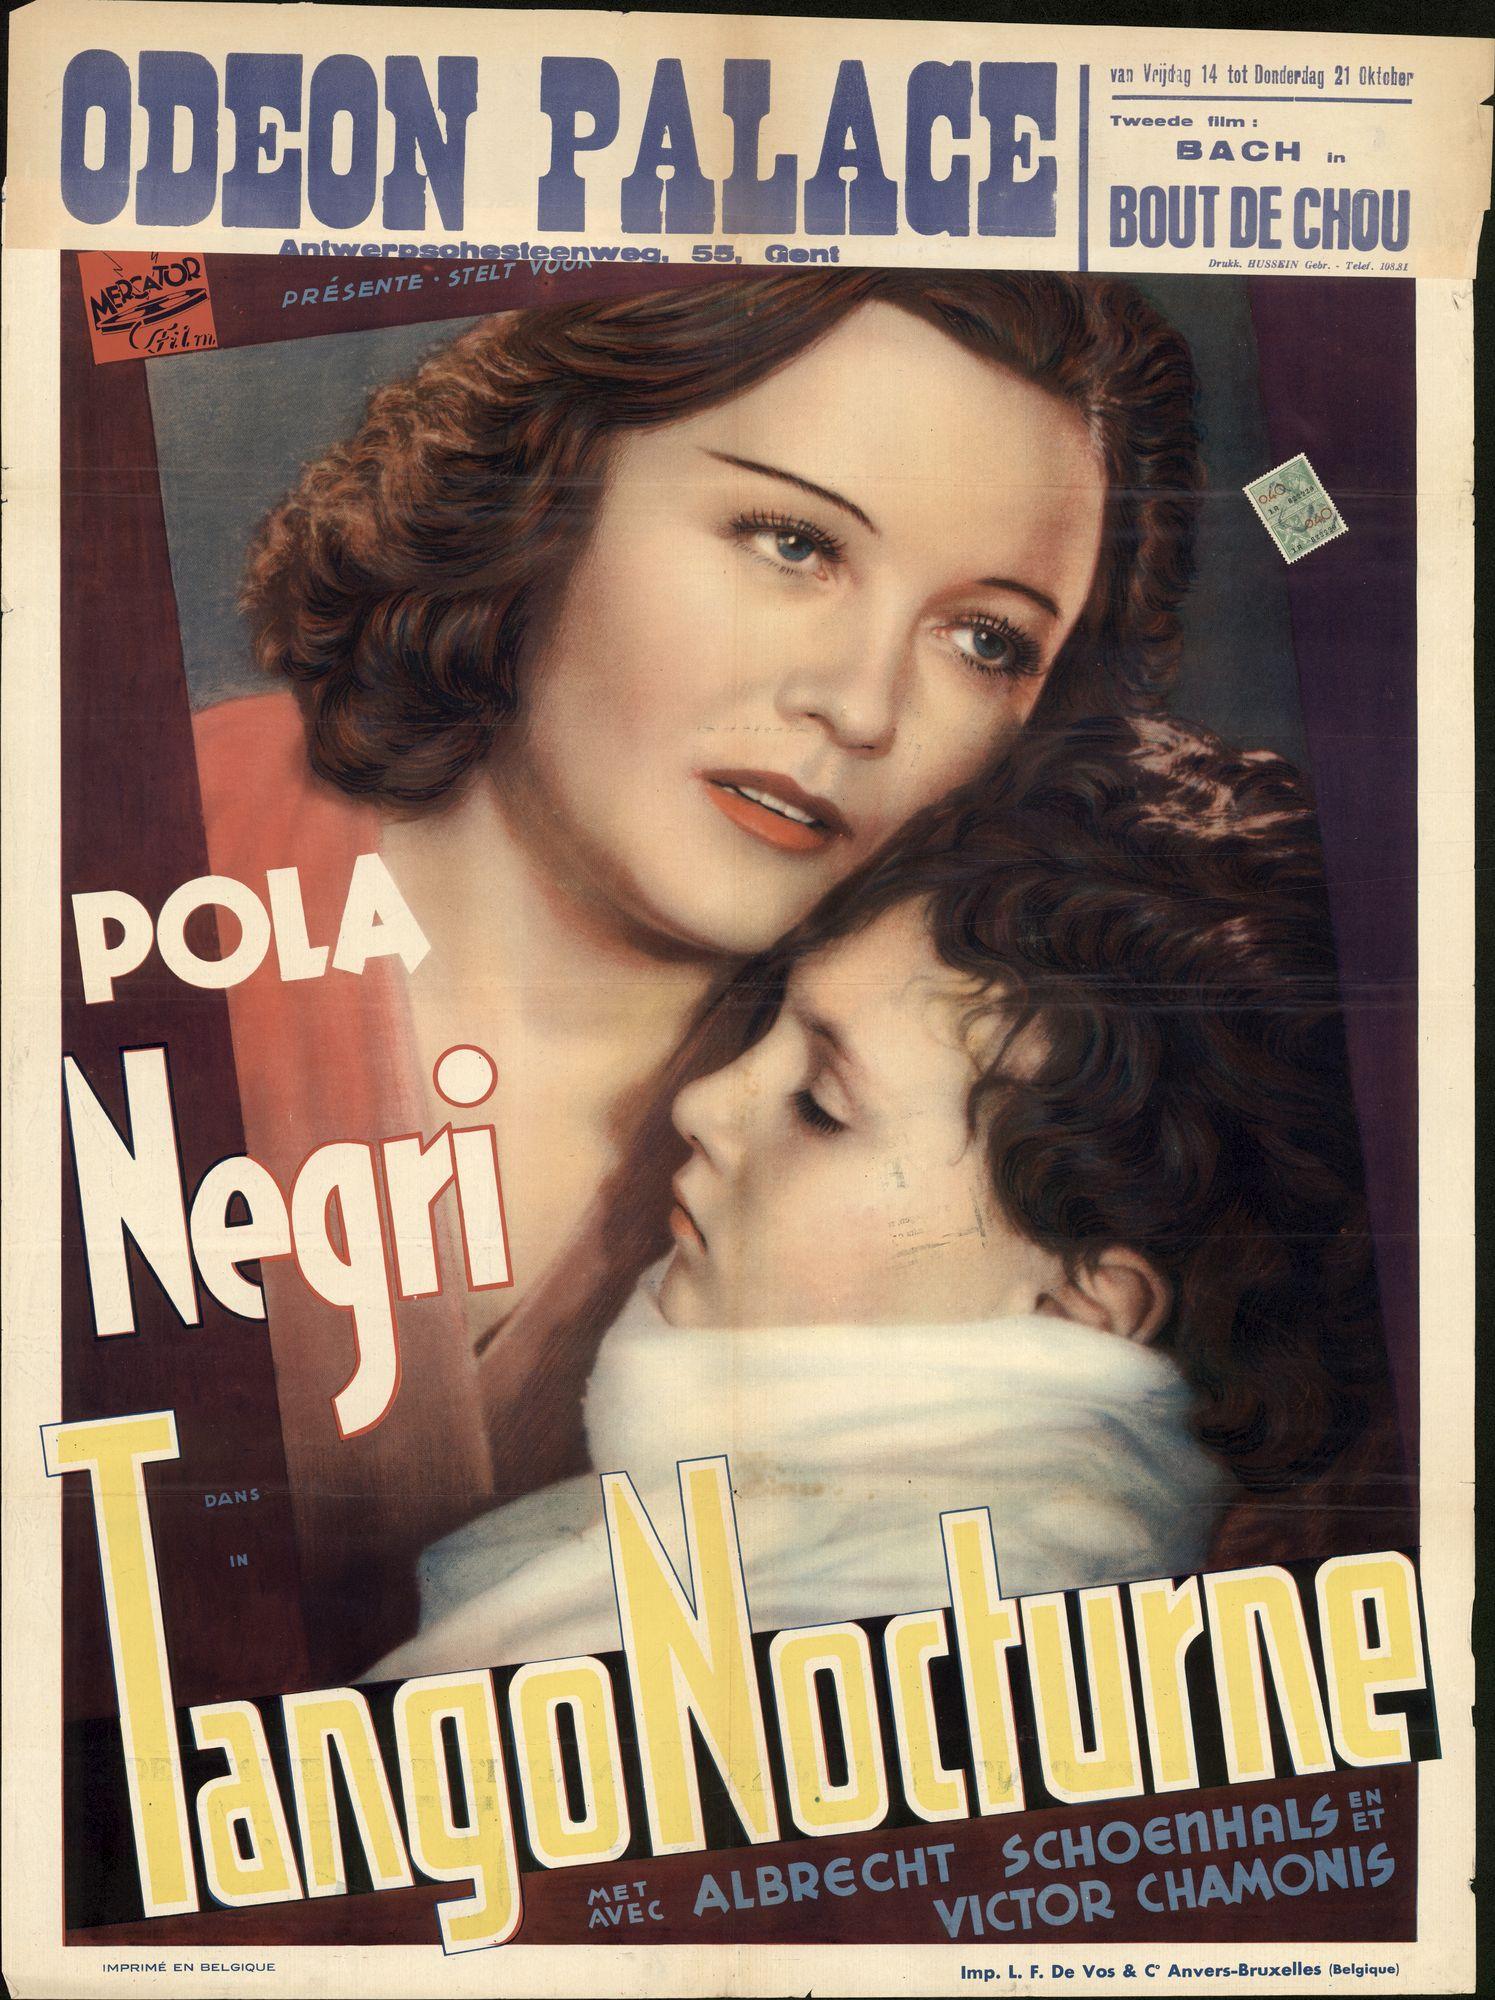 Tango Nocturne, Odeon Palace, Gent, 14 - 21 oktober 1938